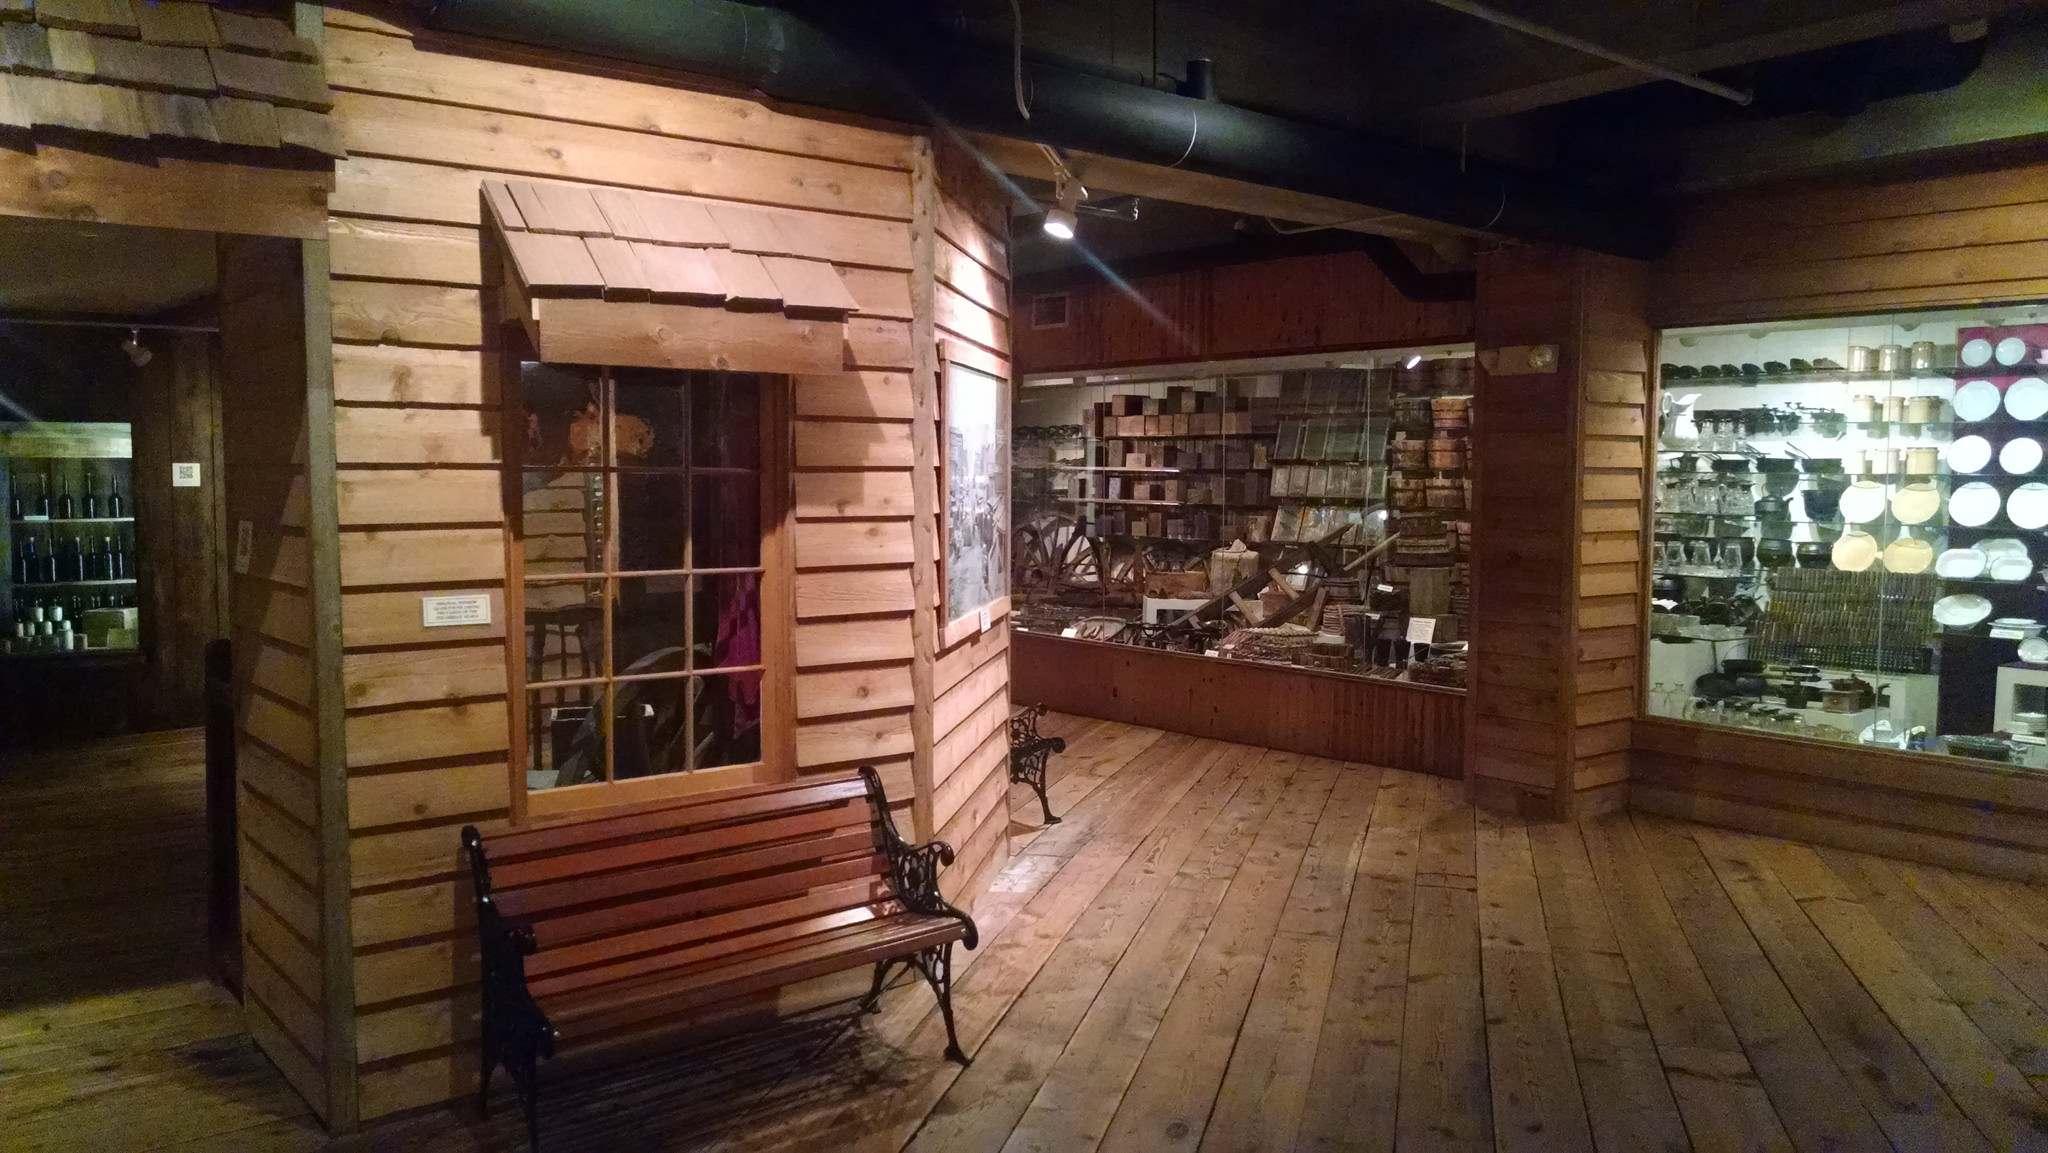 steamboat arabia5 History of Pioneering Midwest   Steamboat Arabia Museum in Kansas City